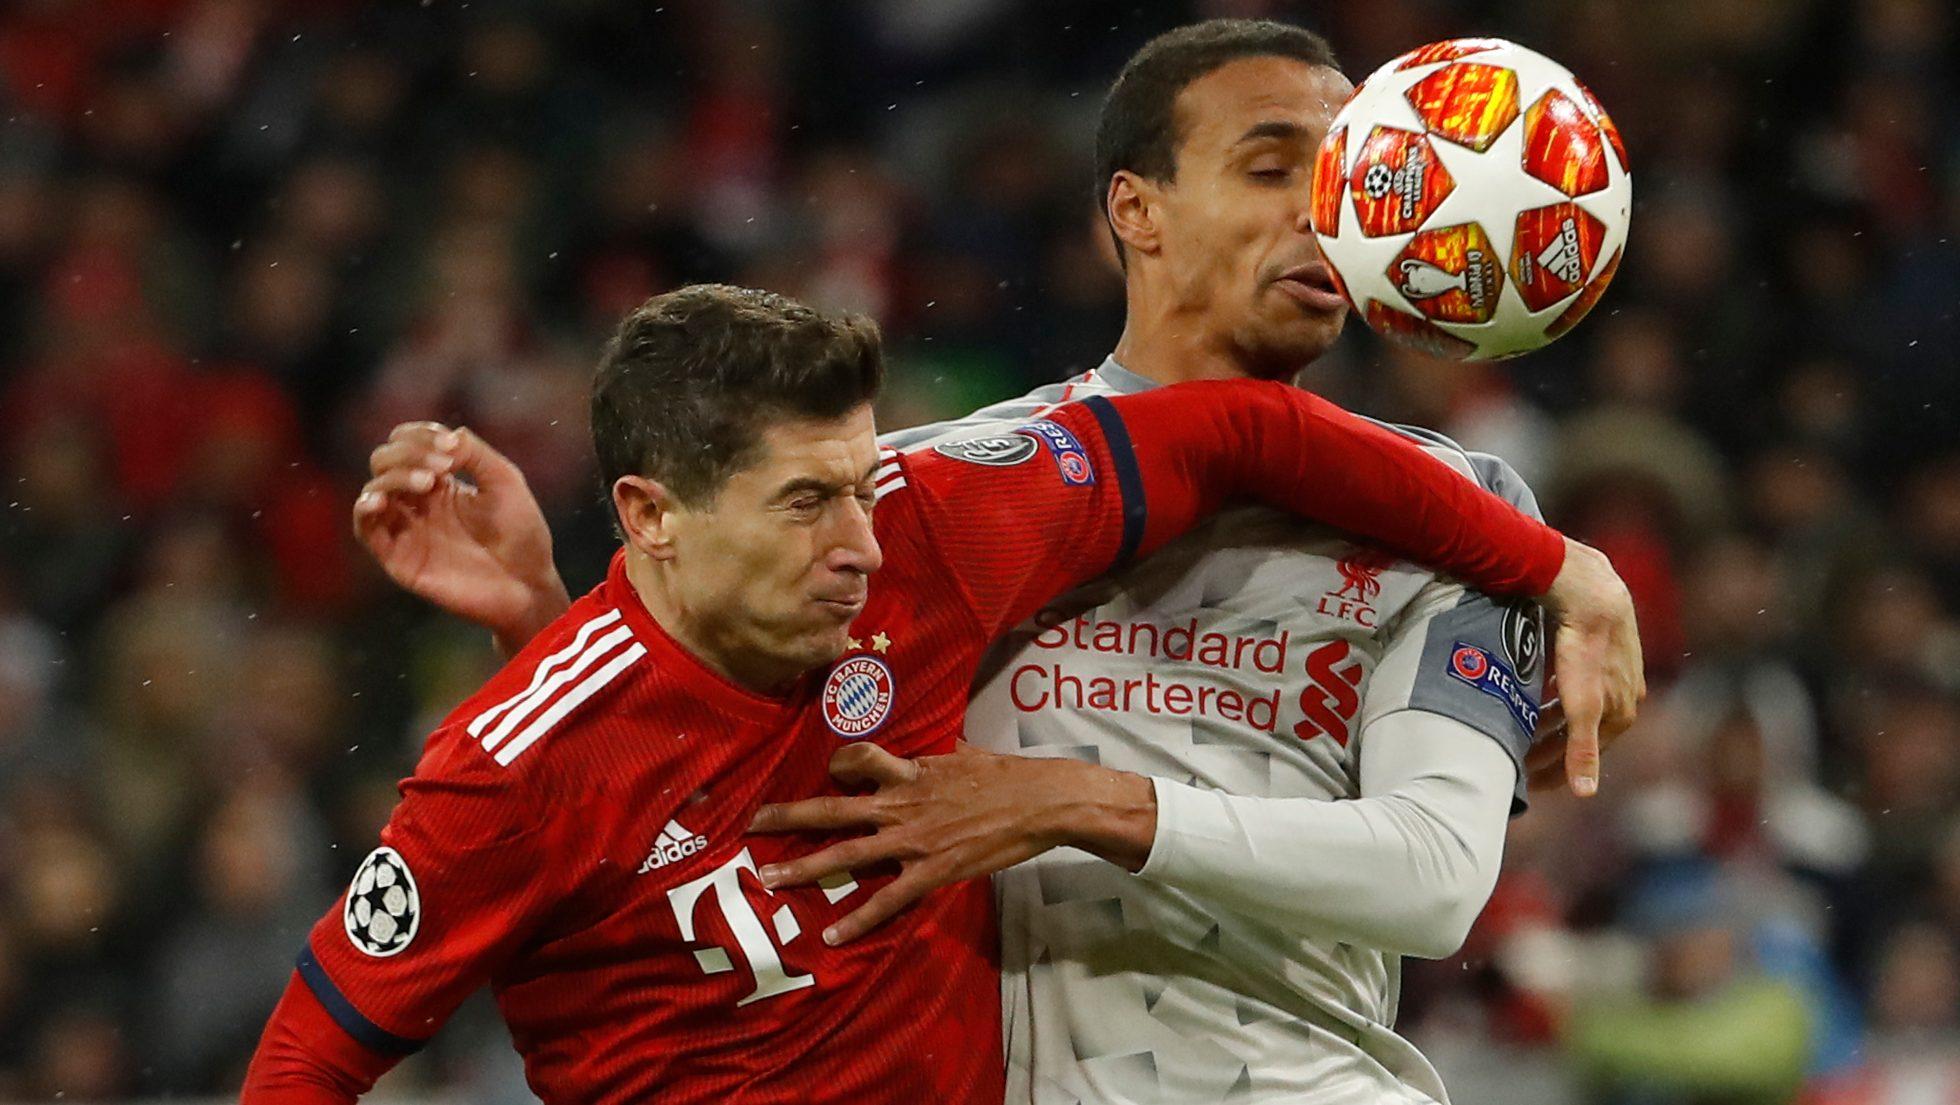 90d78de3 Bayern Munich vs. Liverpool: UEFA Champions League last-16 second leg - As  it happened! 18 weeks ago